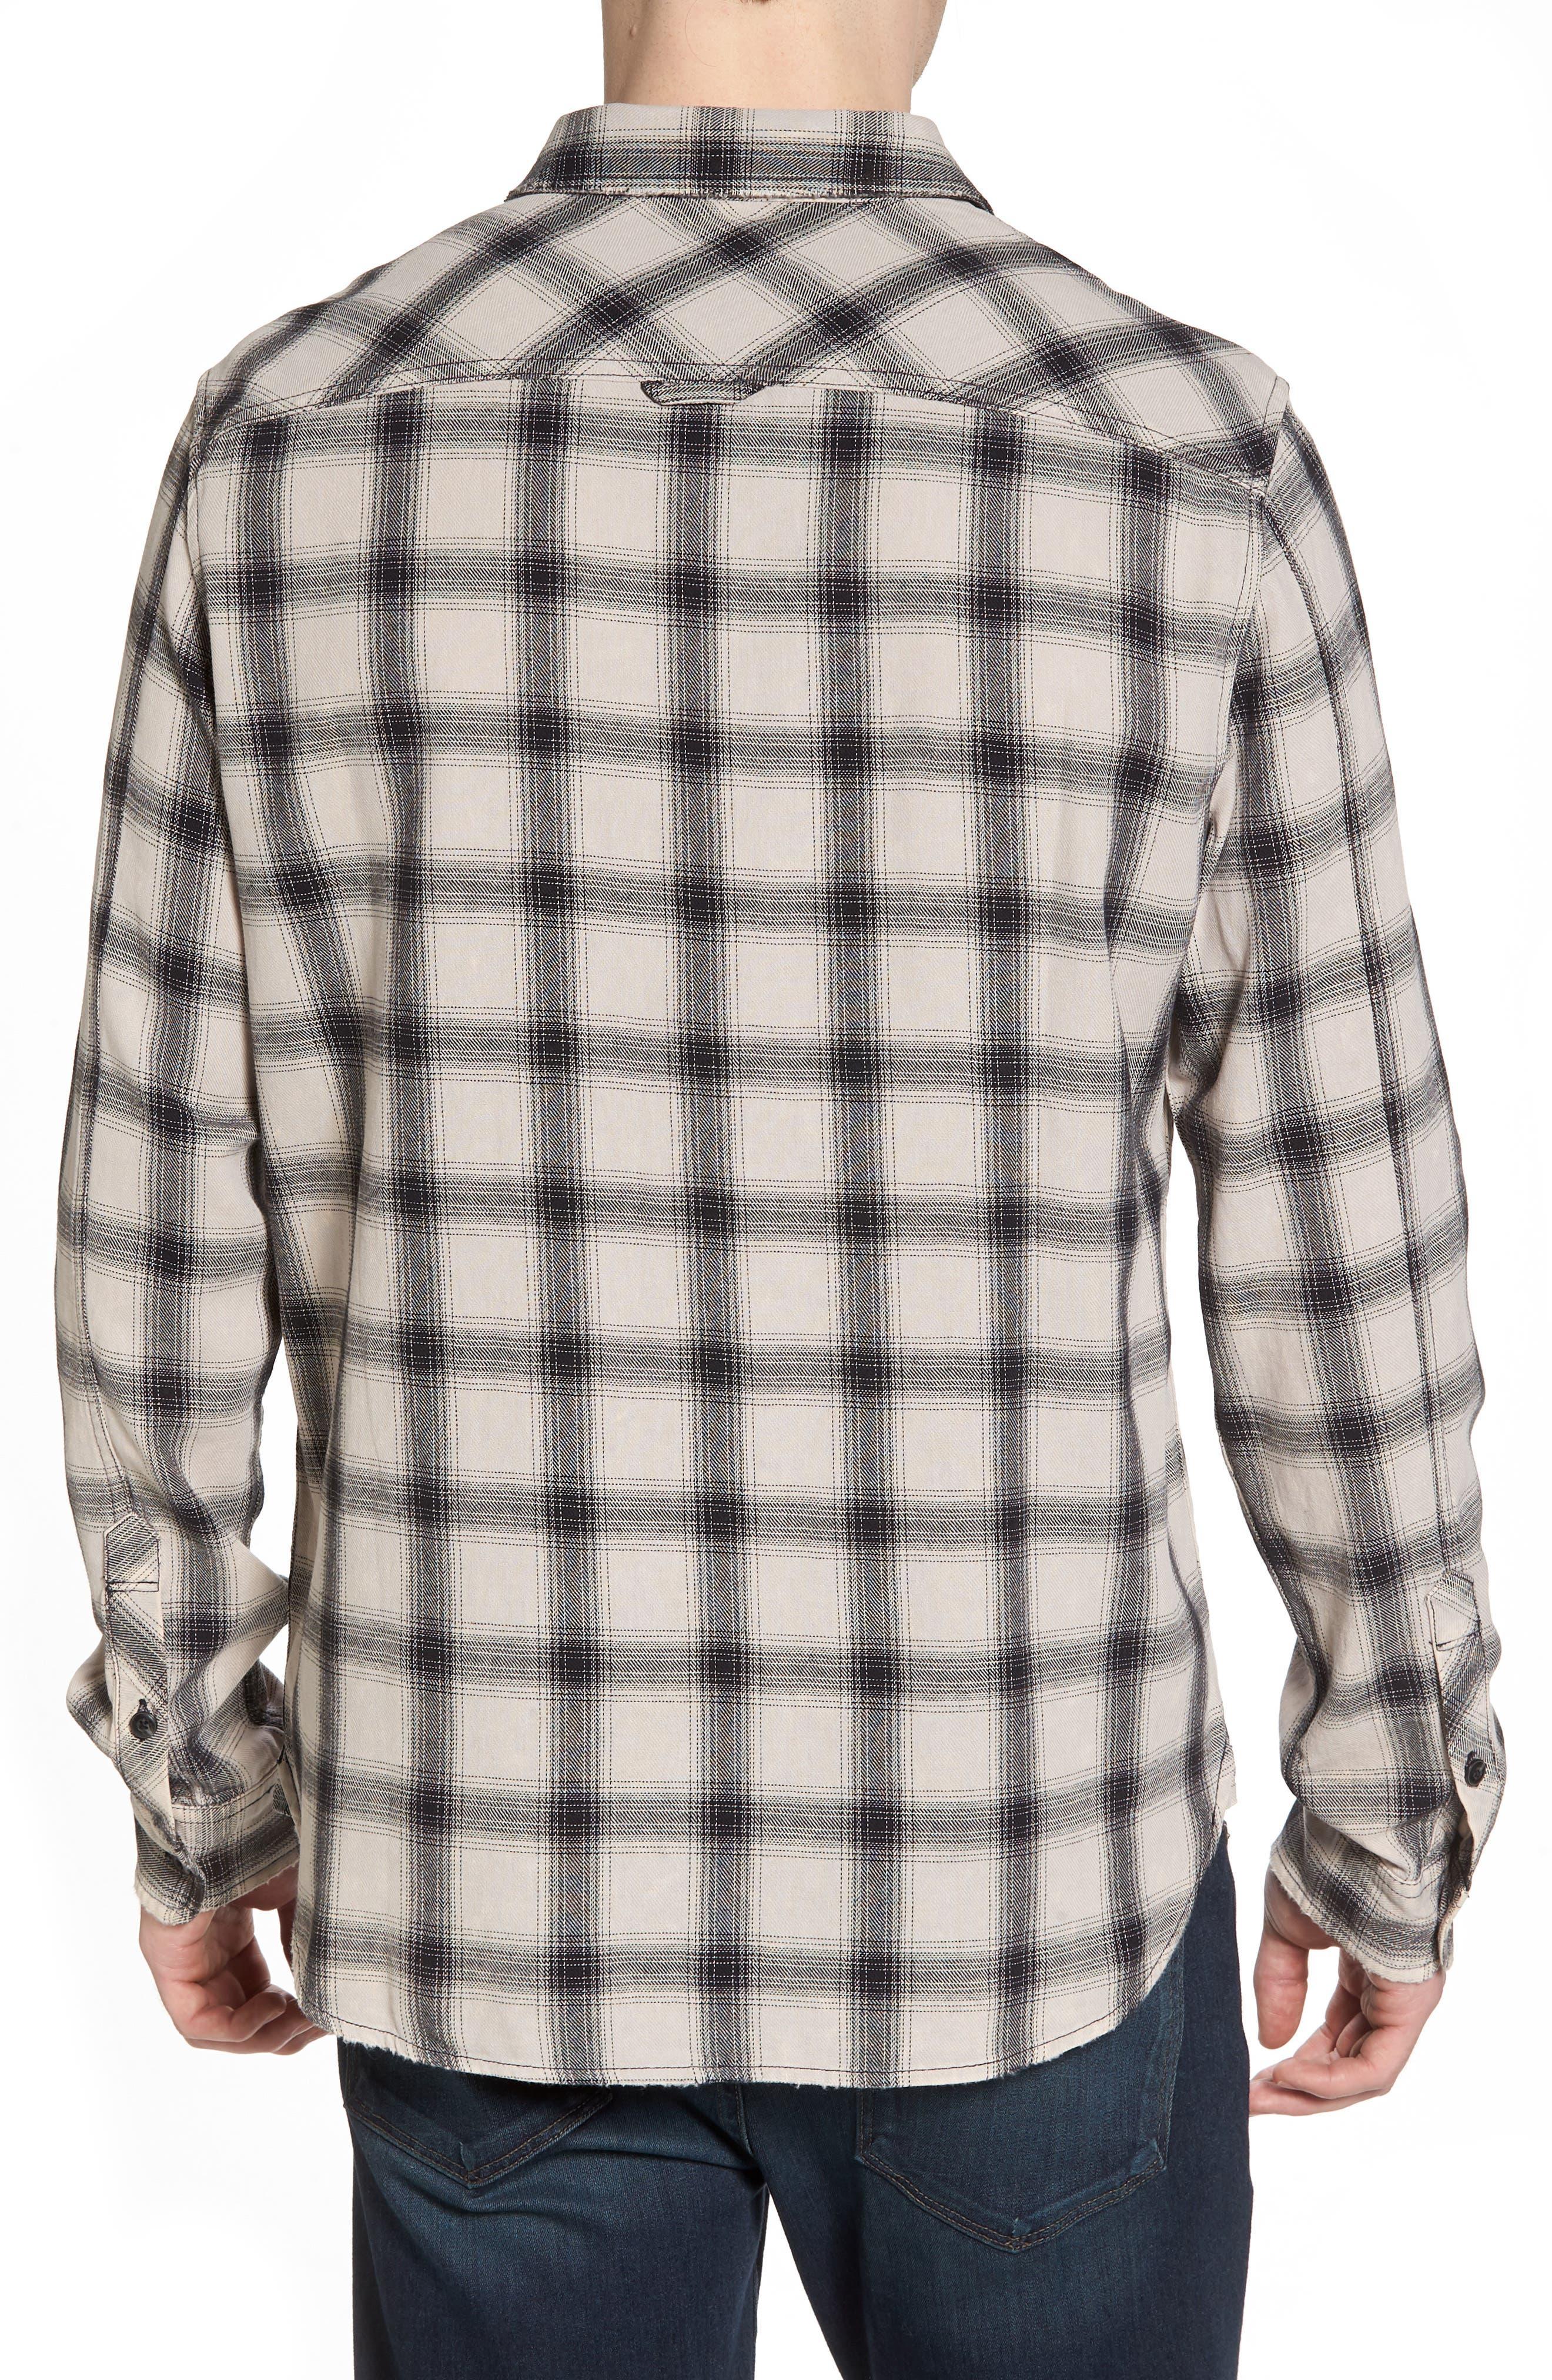 Colton Slim Fit Plaid Sport Shirt,                             Alternate thumbnail 2, color,                             15 Years Mineral Veil/ Black